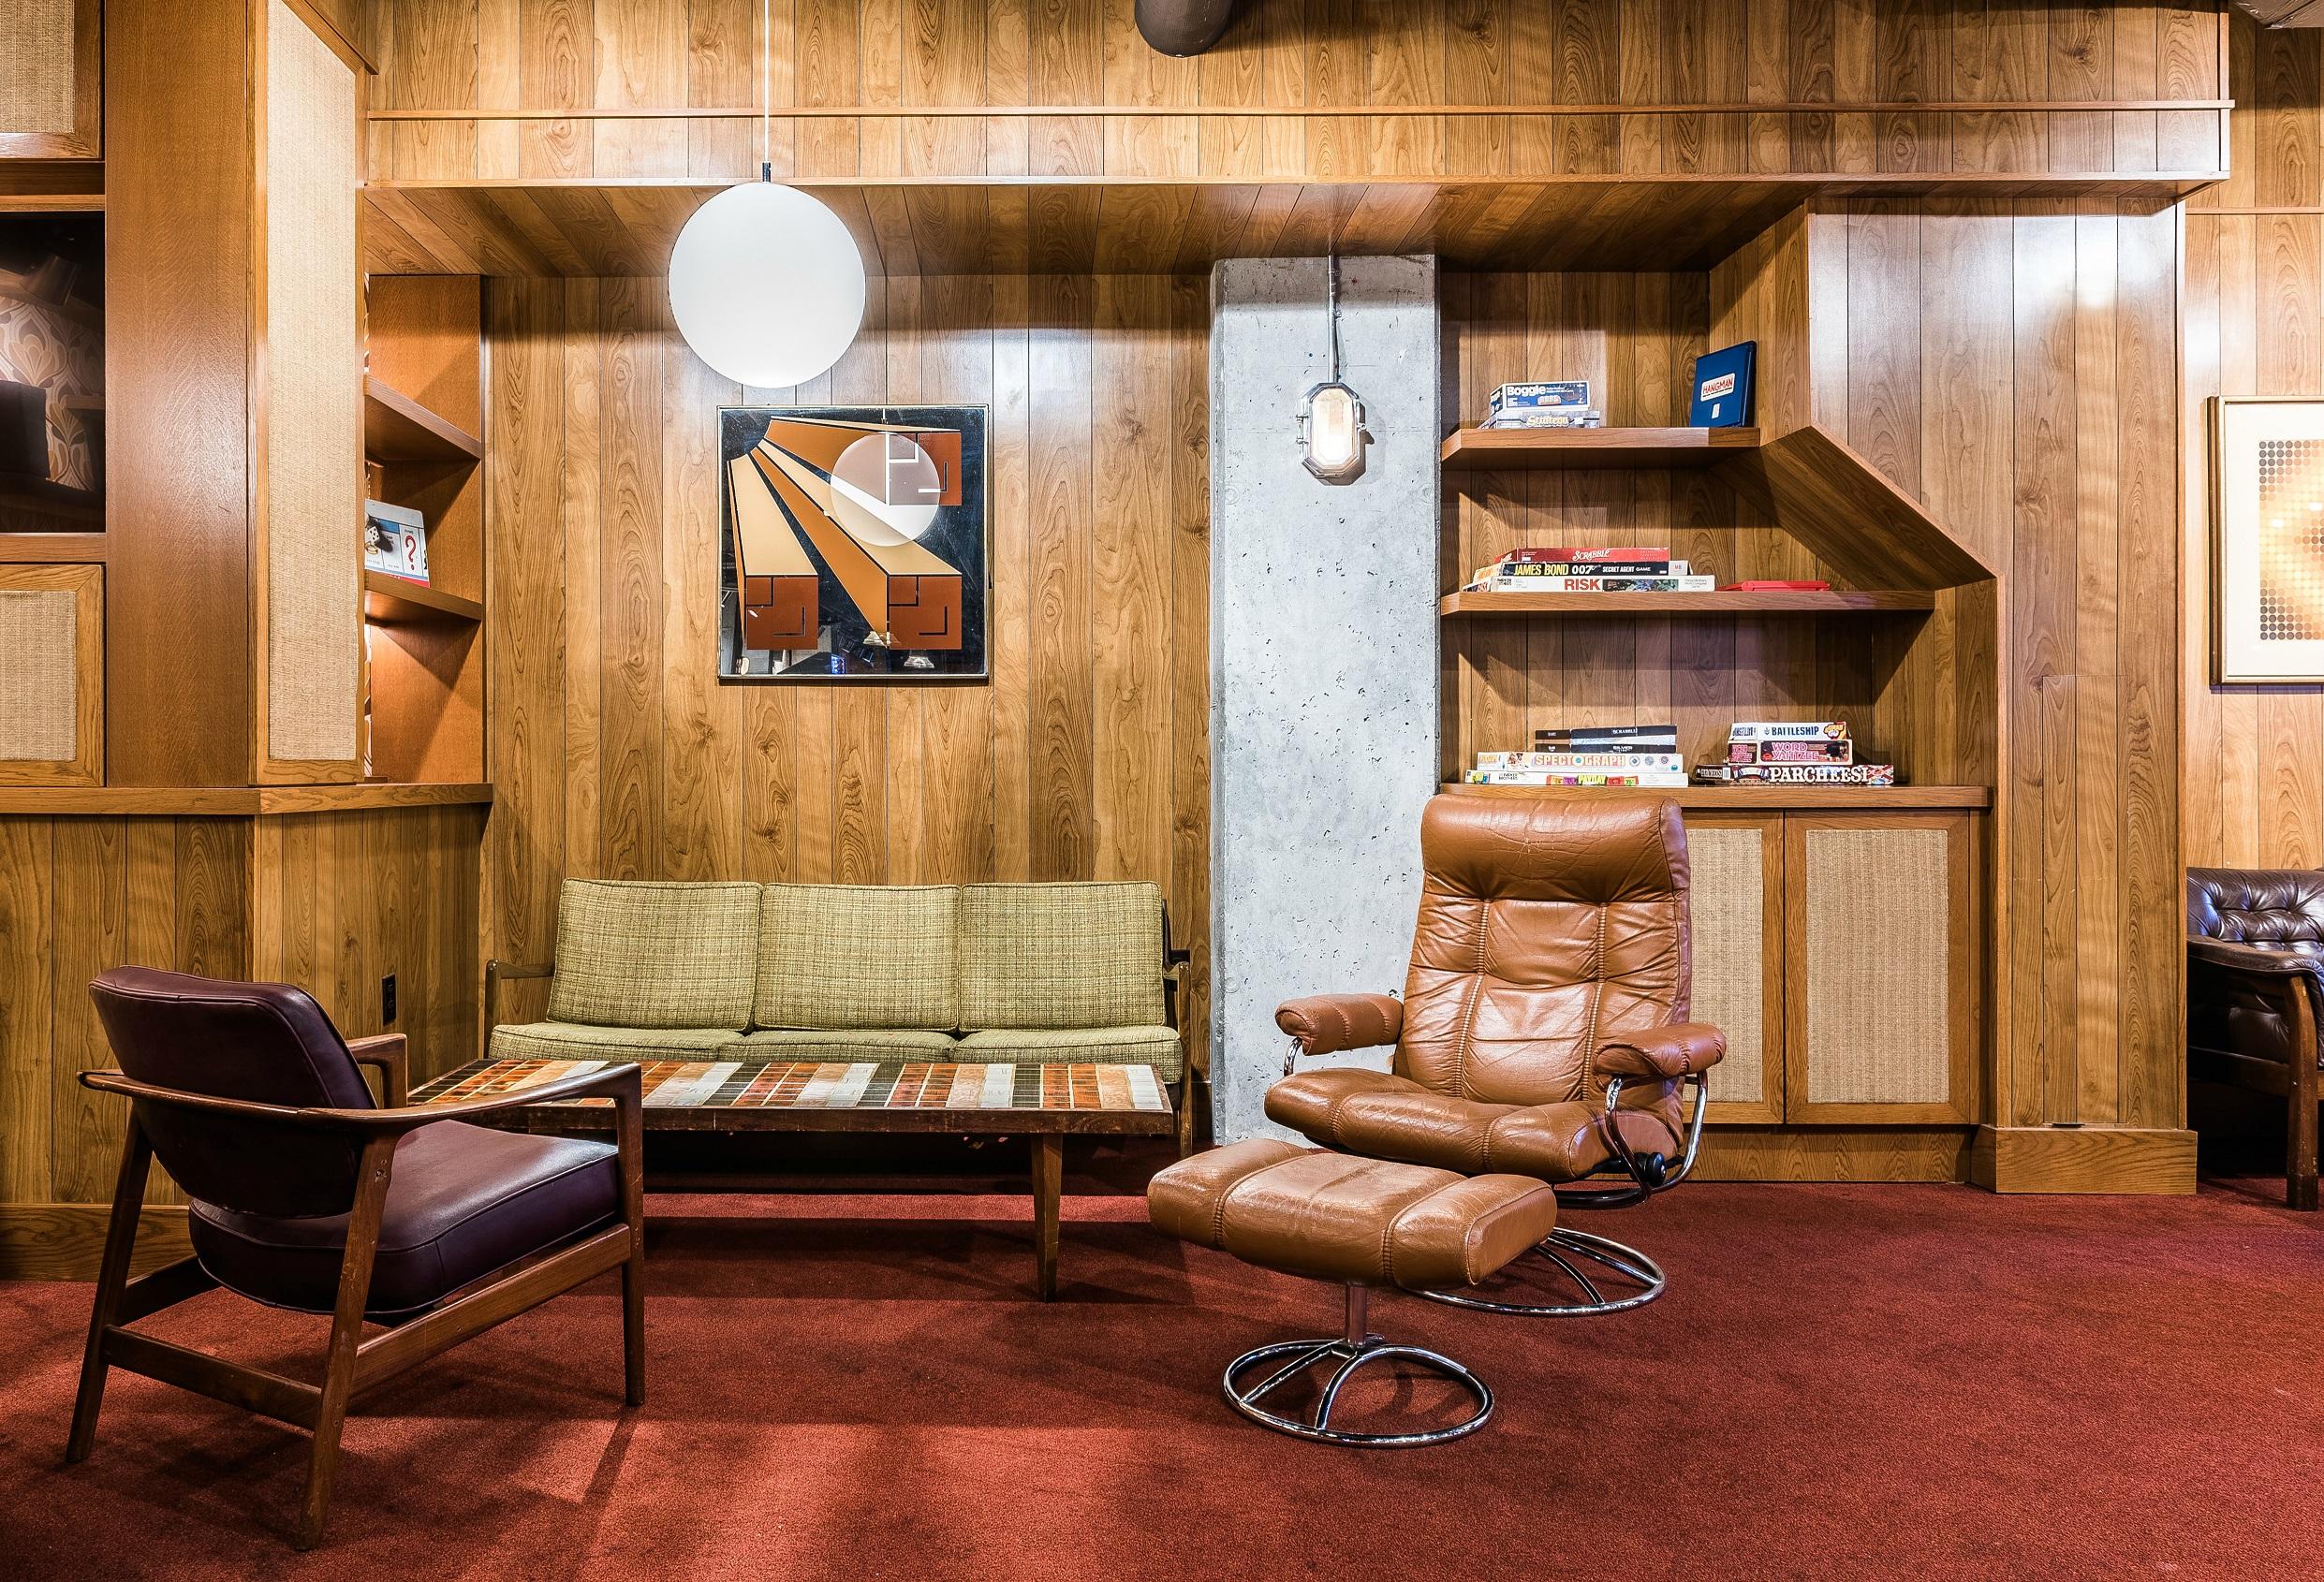 studio-saint-bars-and-restaurants-players-club-washington-dc-lopez-view1.jpg